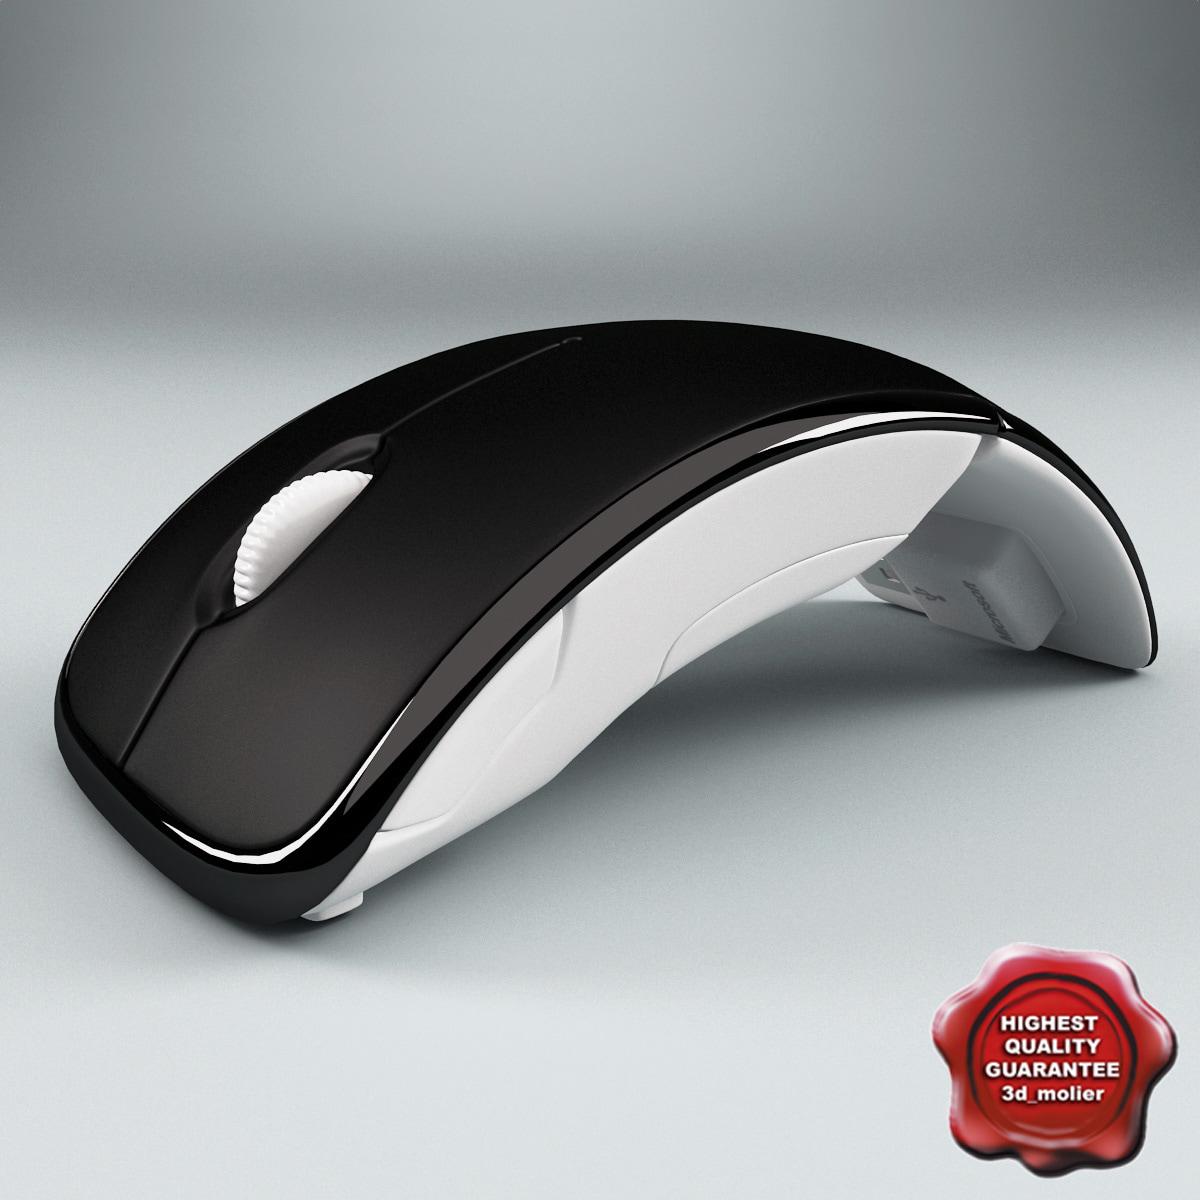 Microsoft_Arc_Mouse_00.jpg